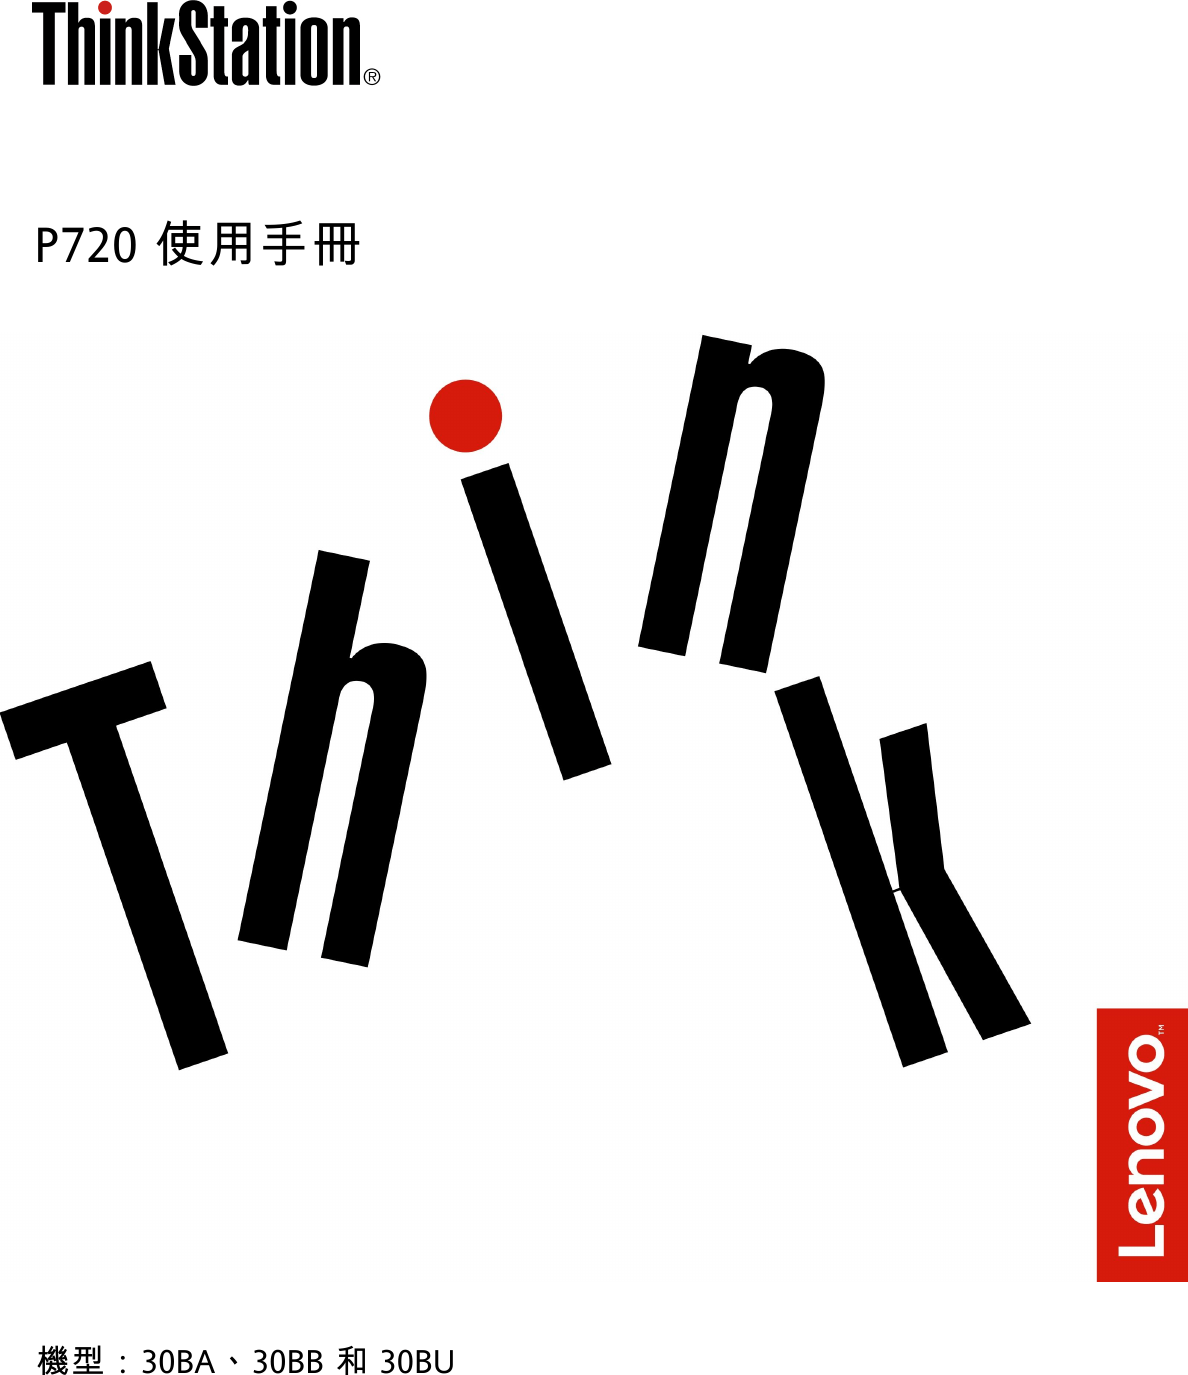 Lenovo P720 Ug Zh Tw 使用手册 (Chinese Traditional) User Guide